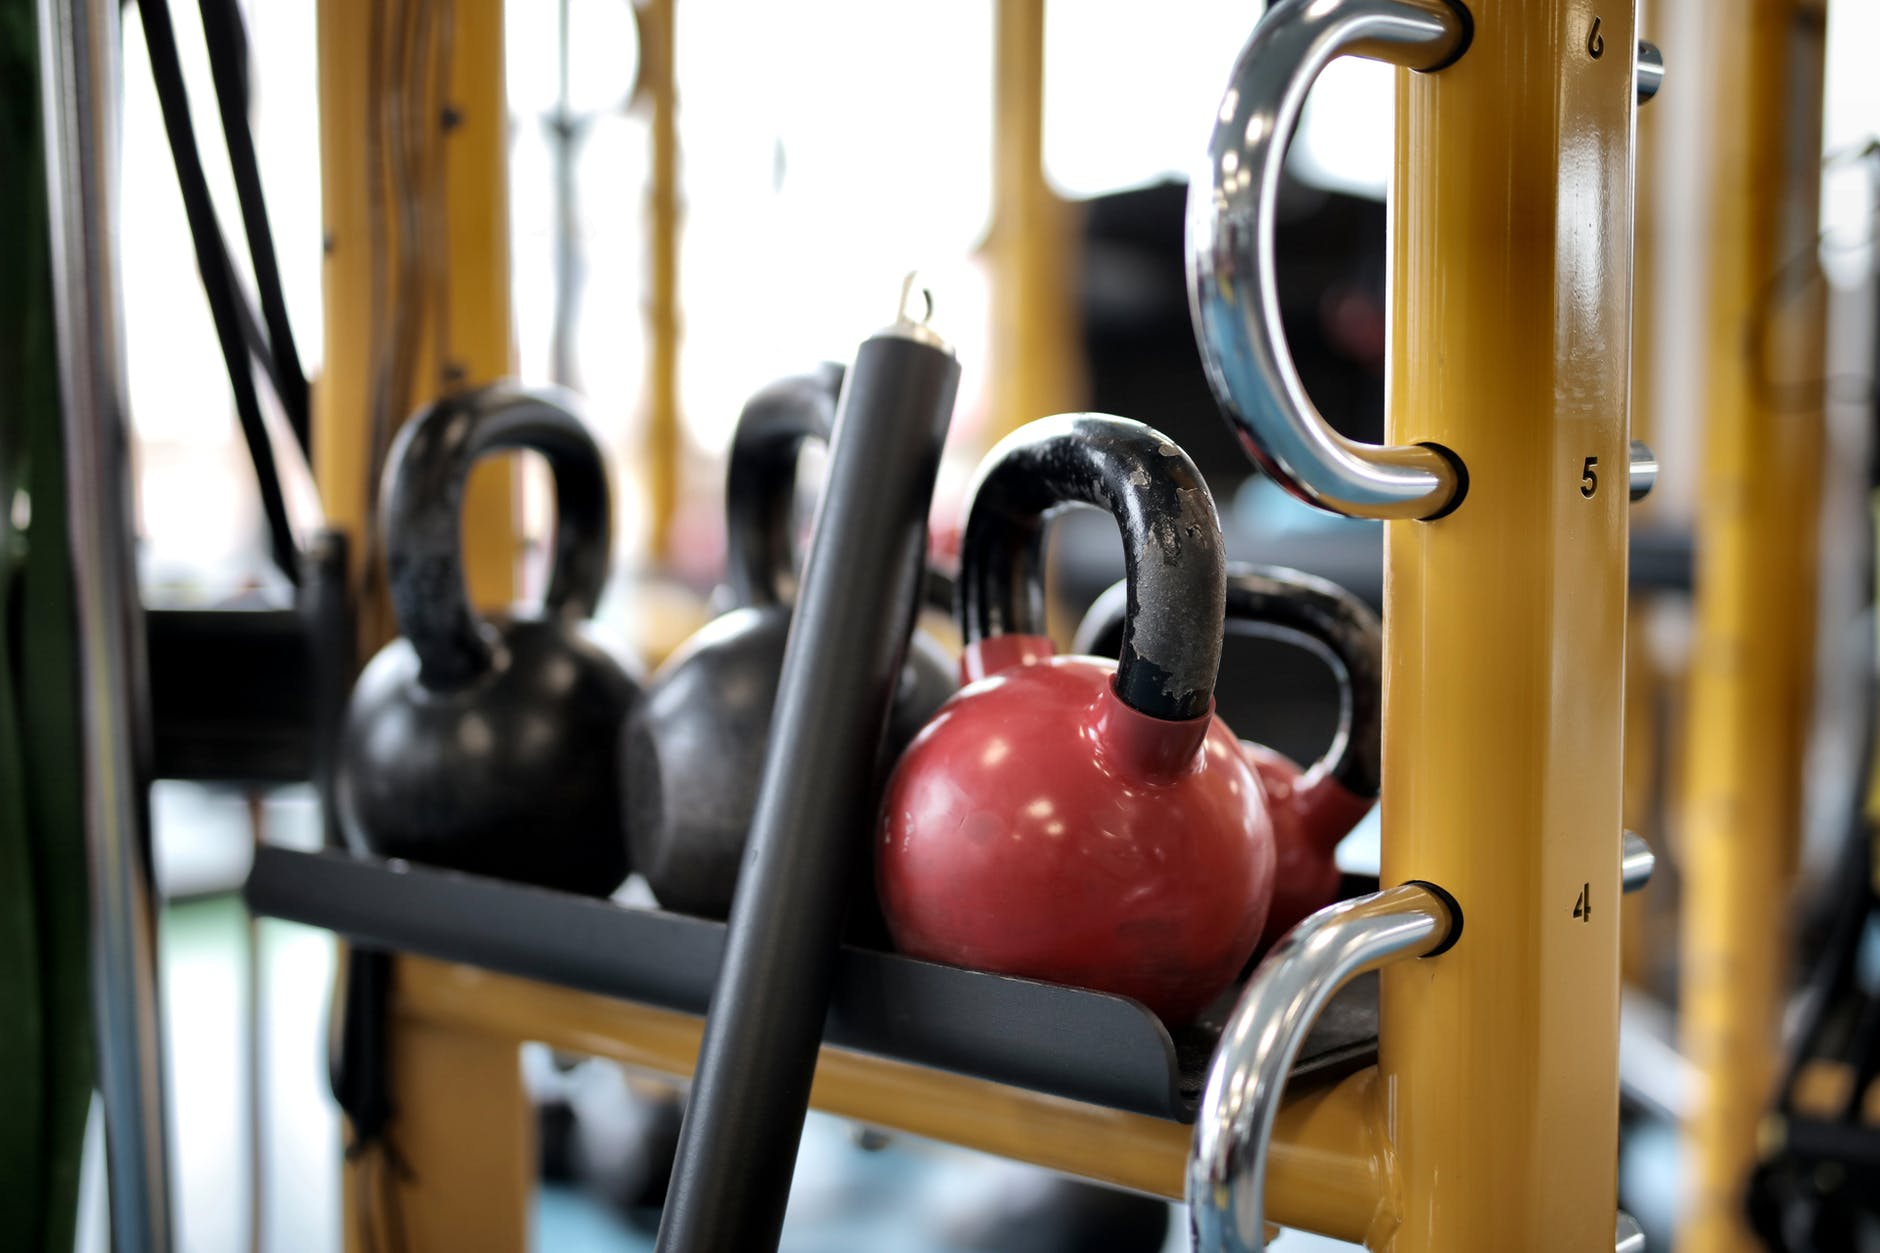 several kettlebells on metal bar in gym